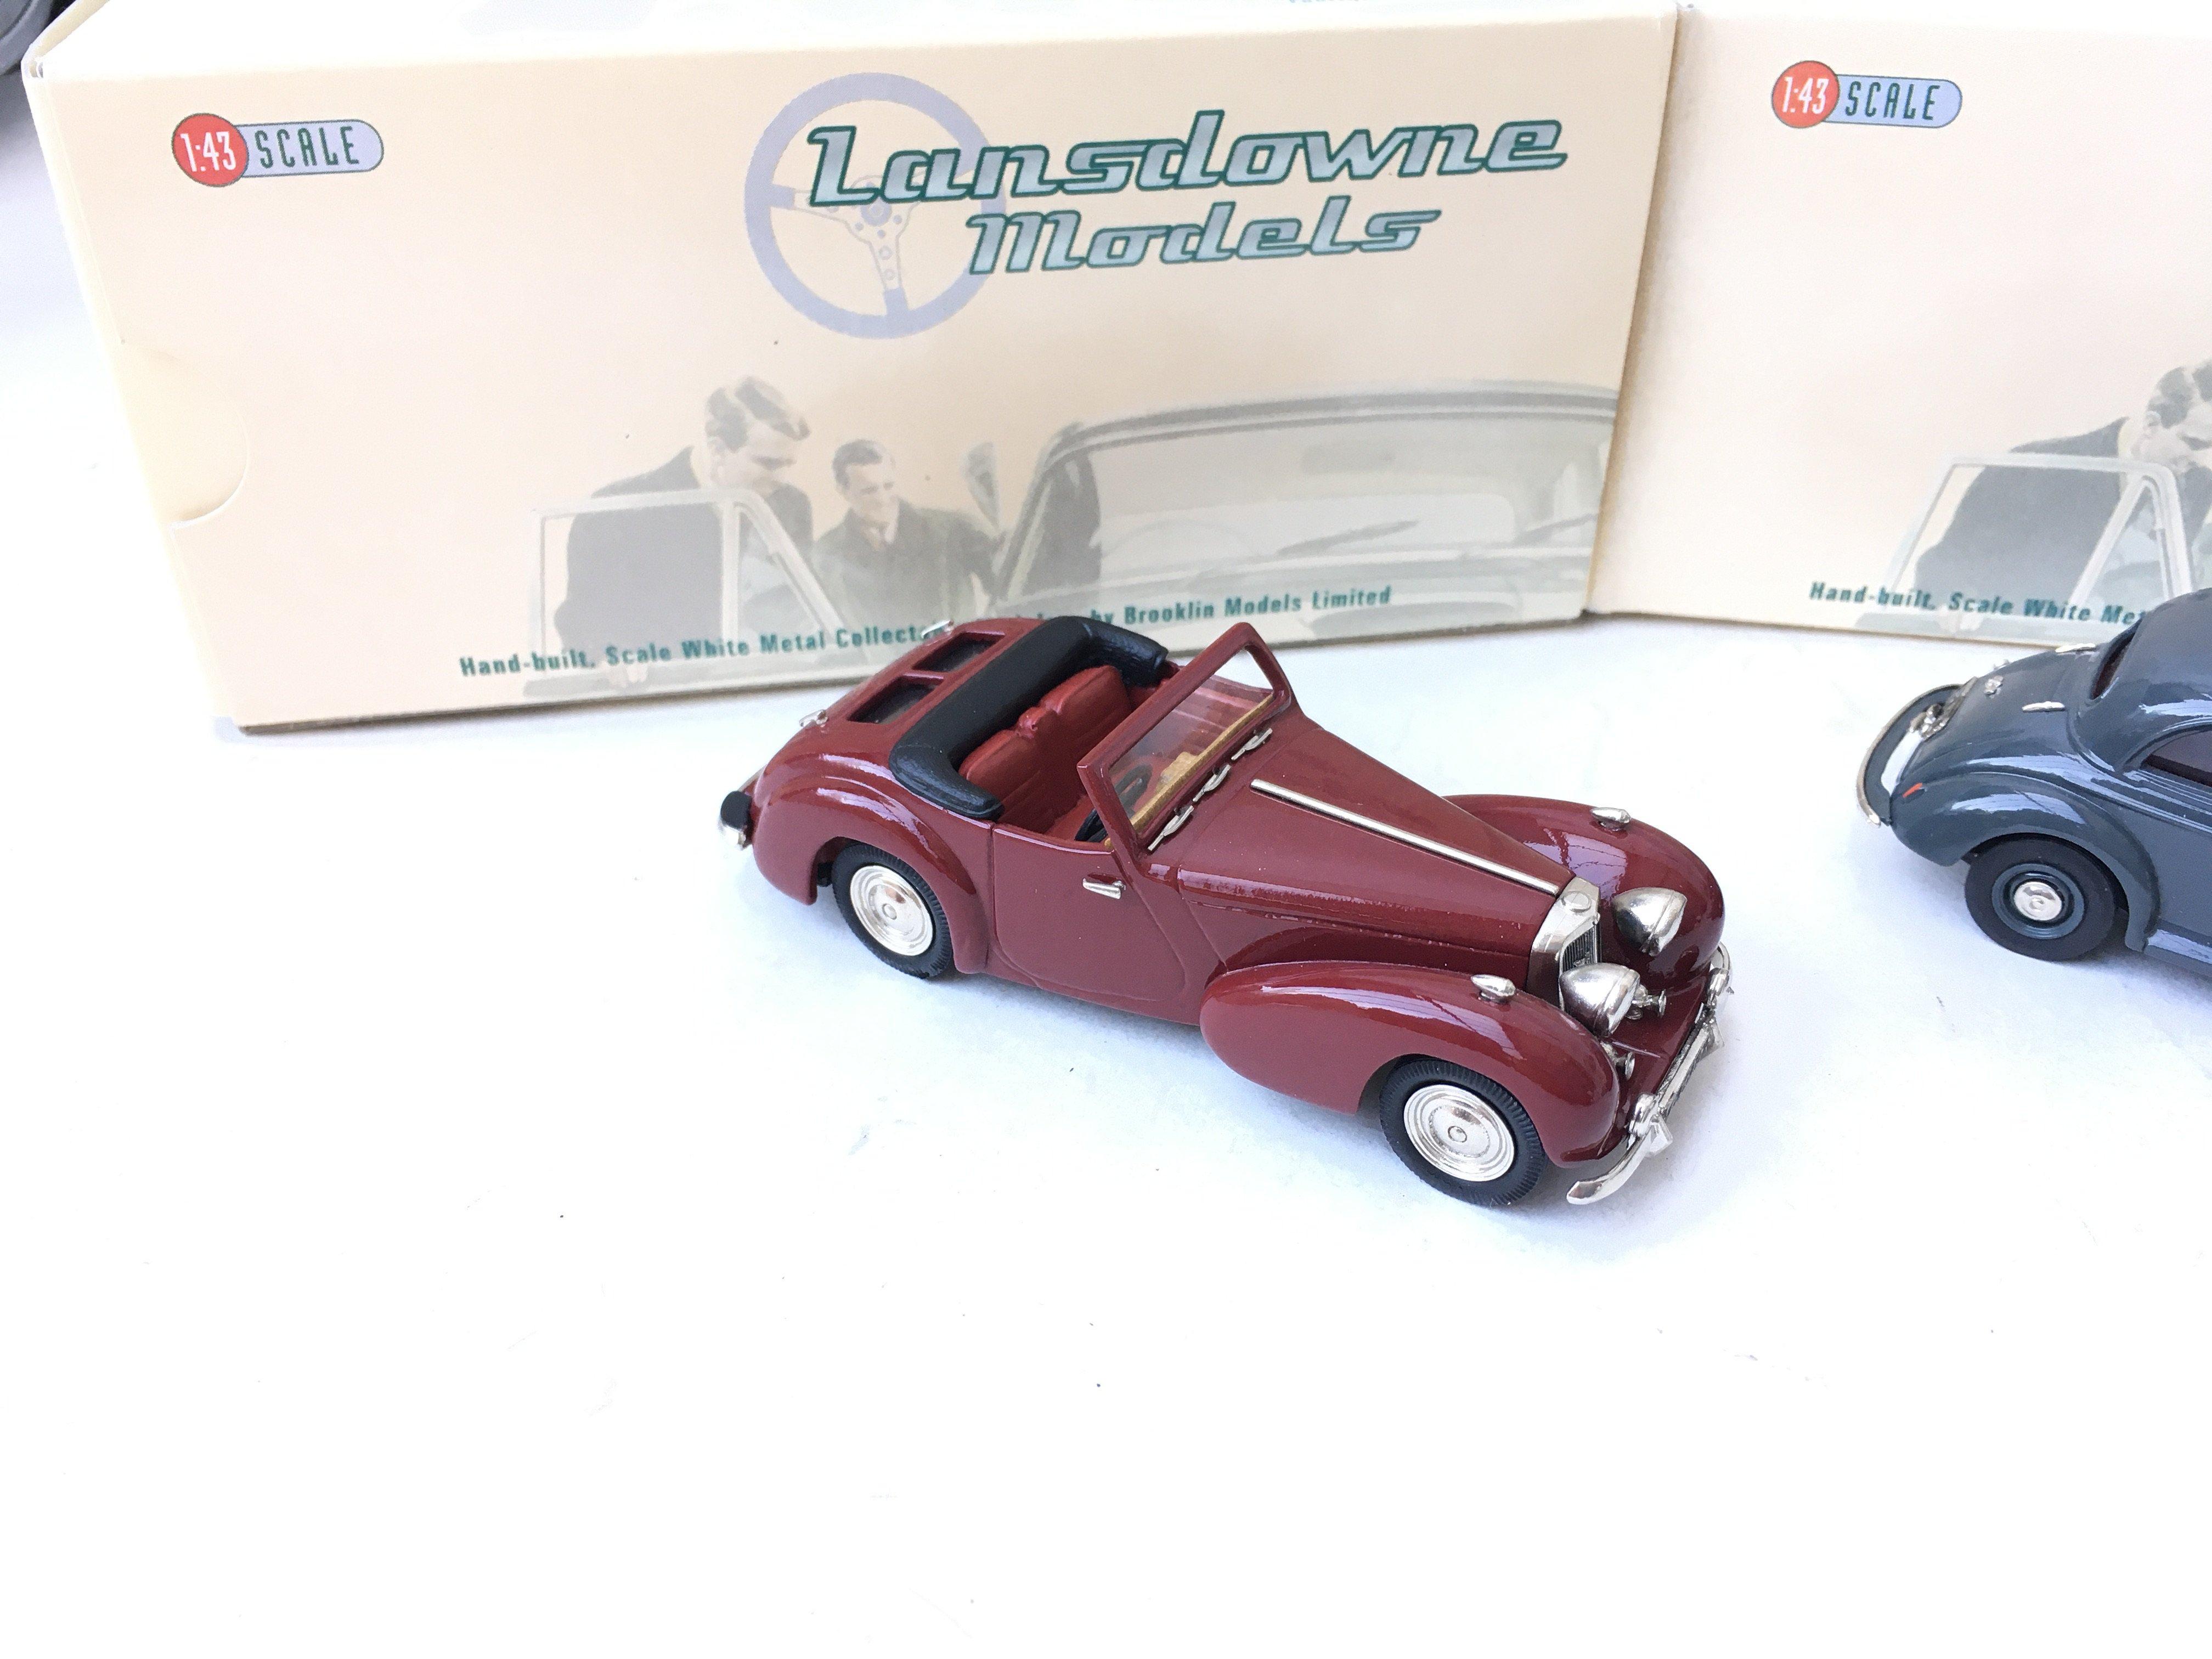 3 X Lansdowne Models including LDM 36 1952 Morris Minor Series II. LDM 37 1949 Triumph 2000 Roadster - Image 2 of 4